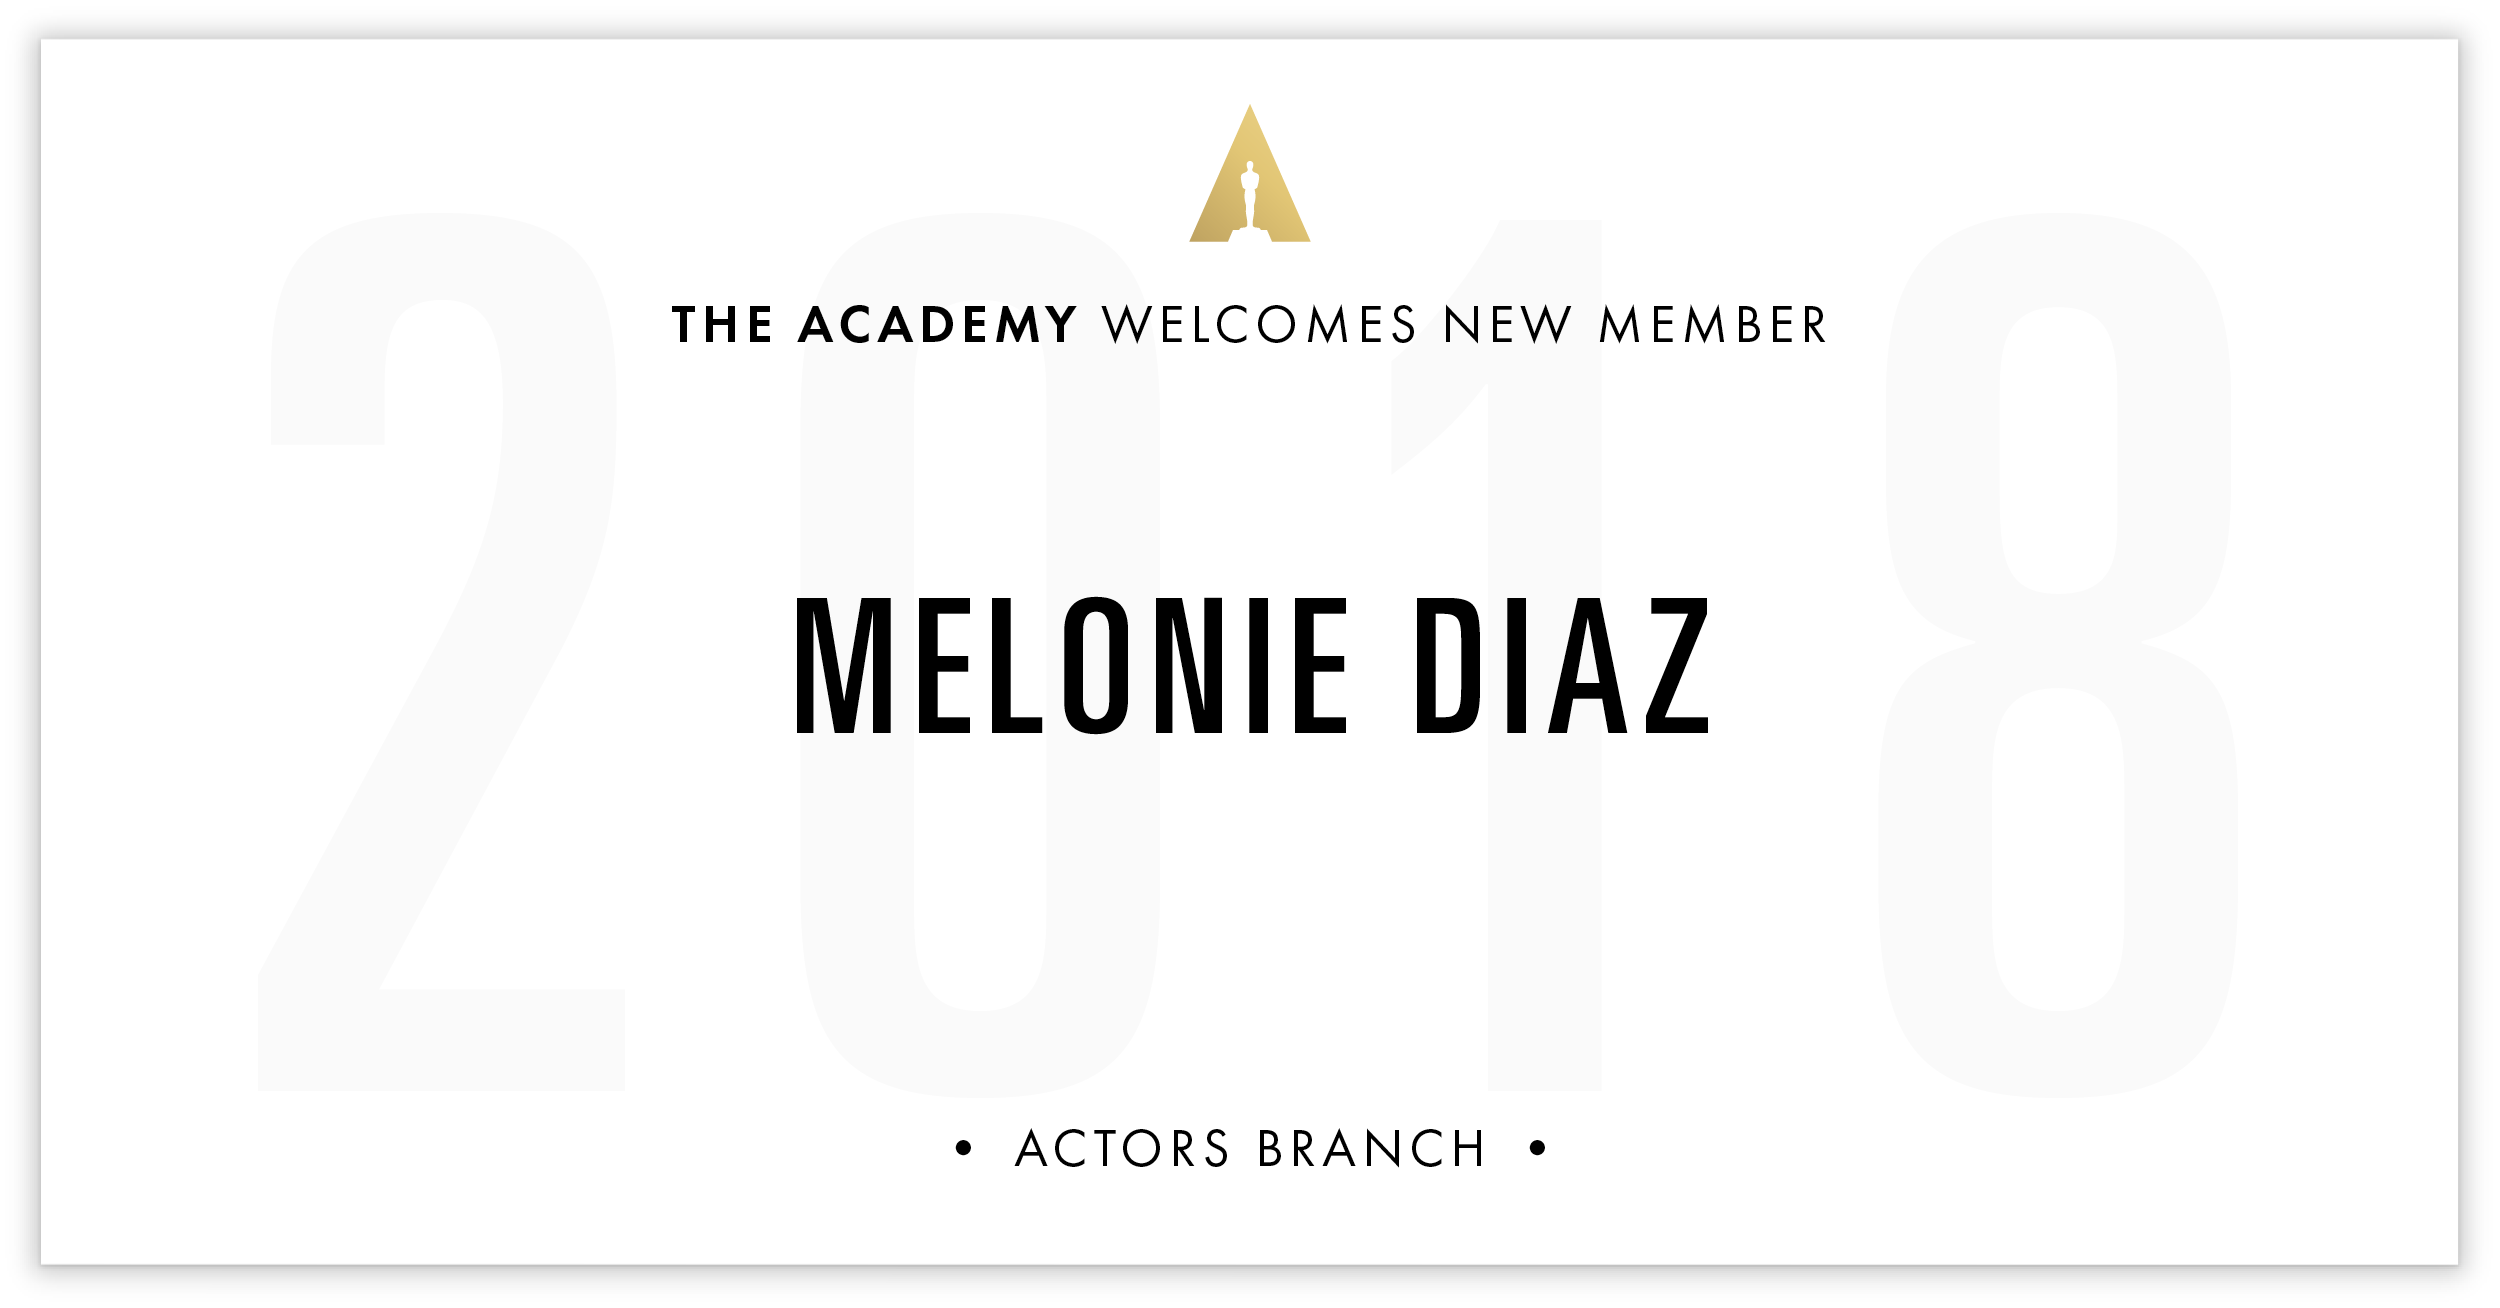 Melonie Diaz is invited!